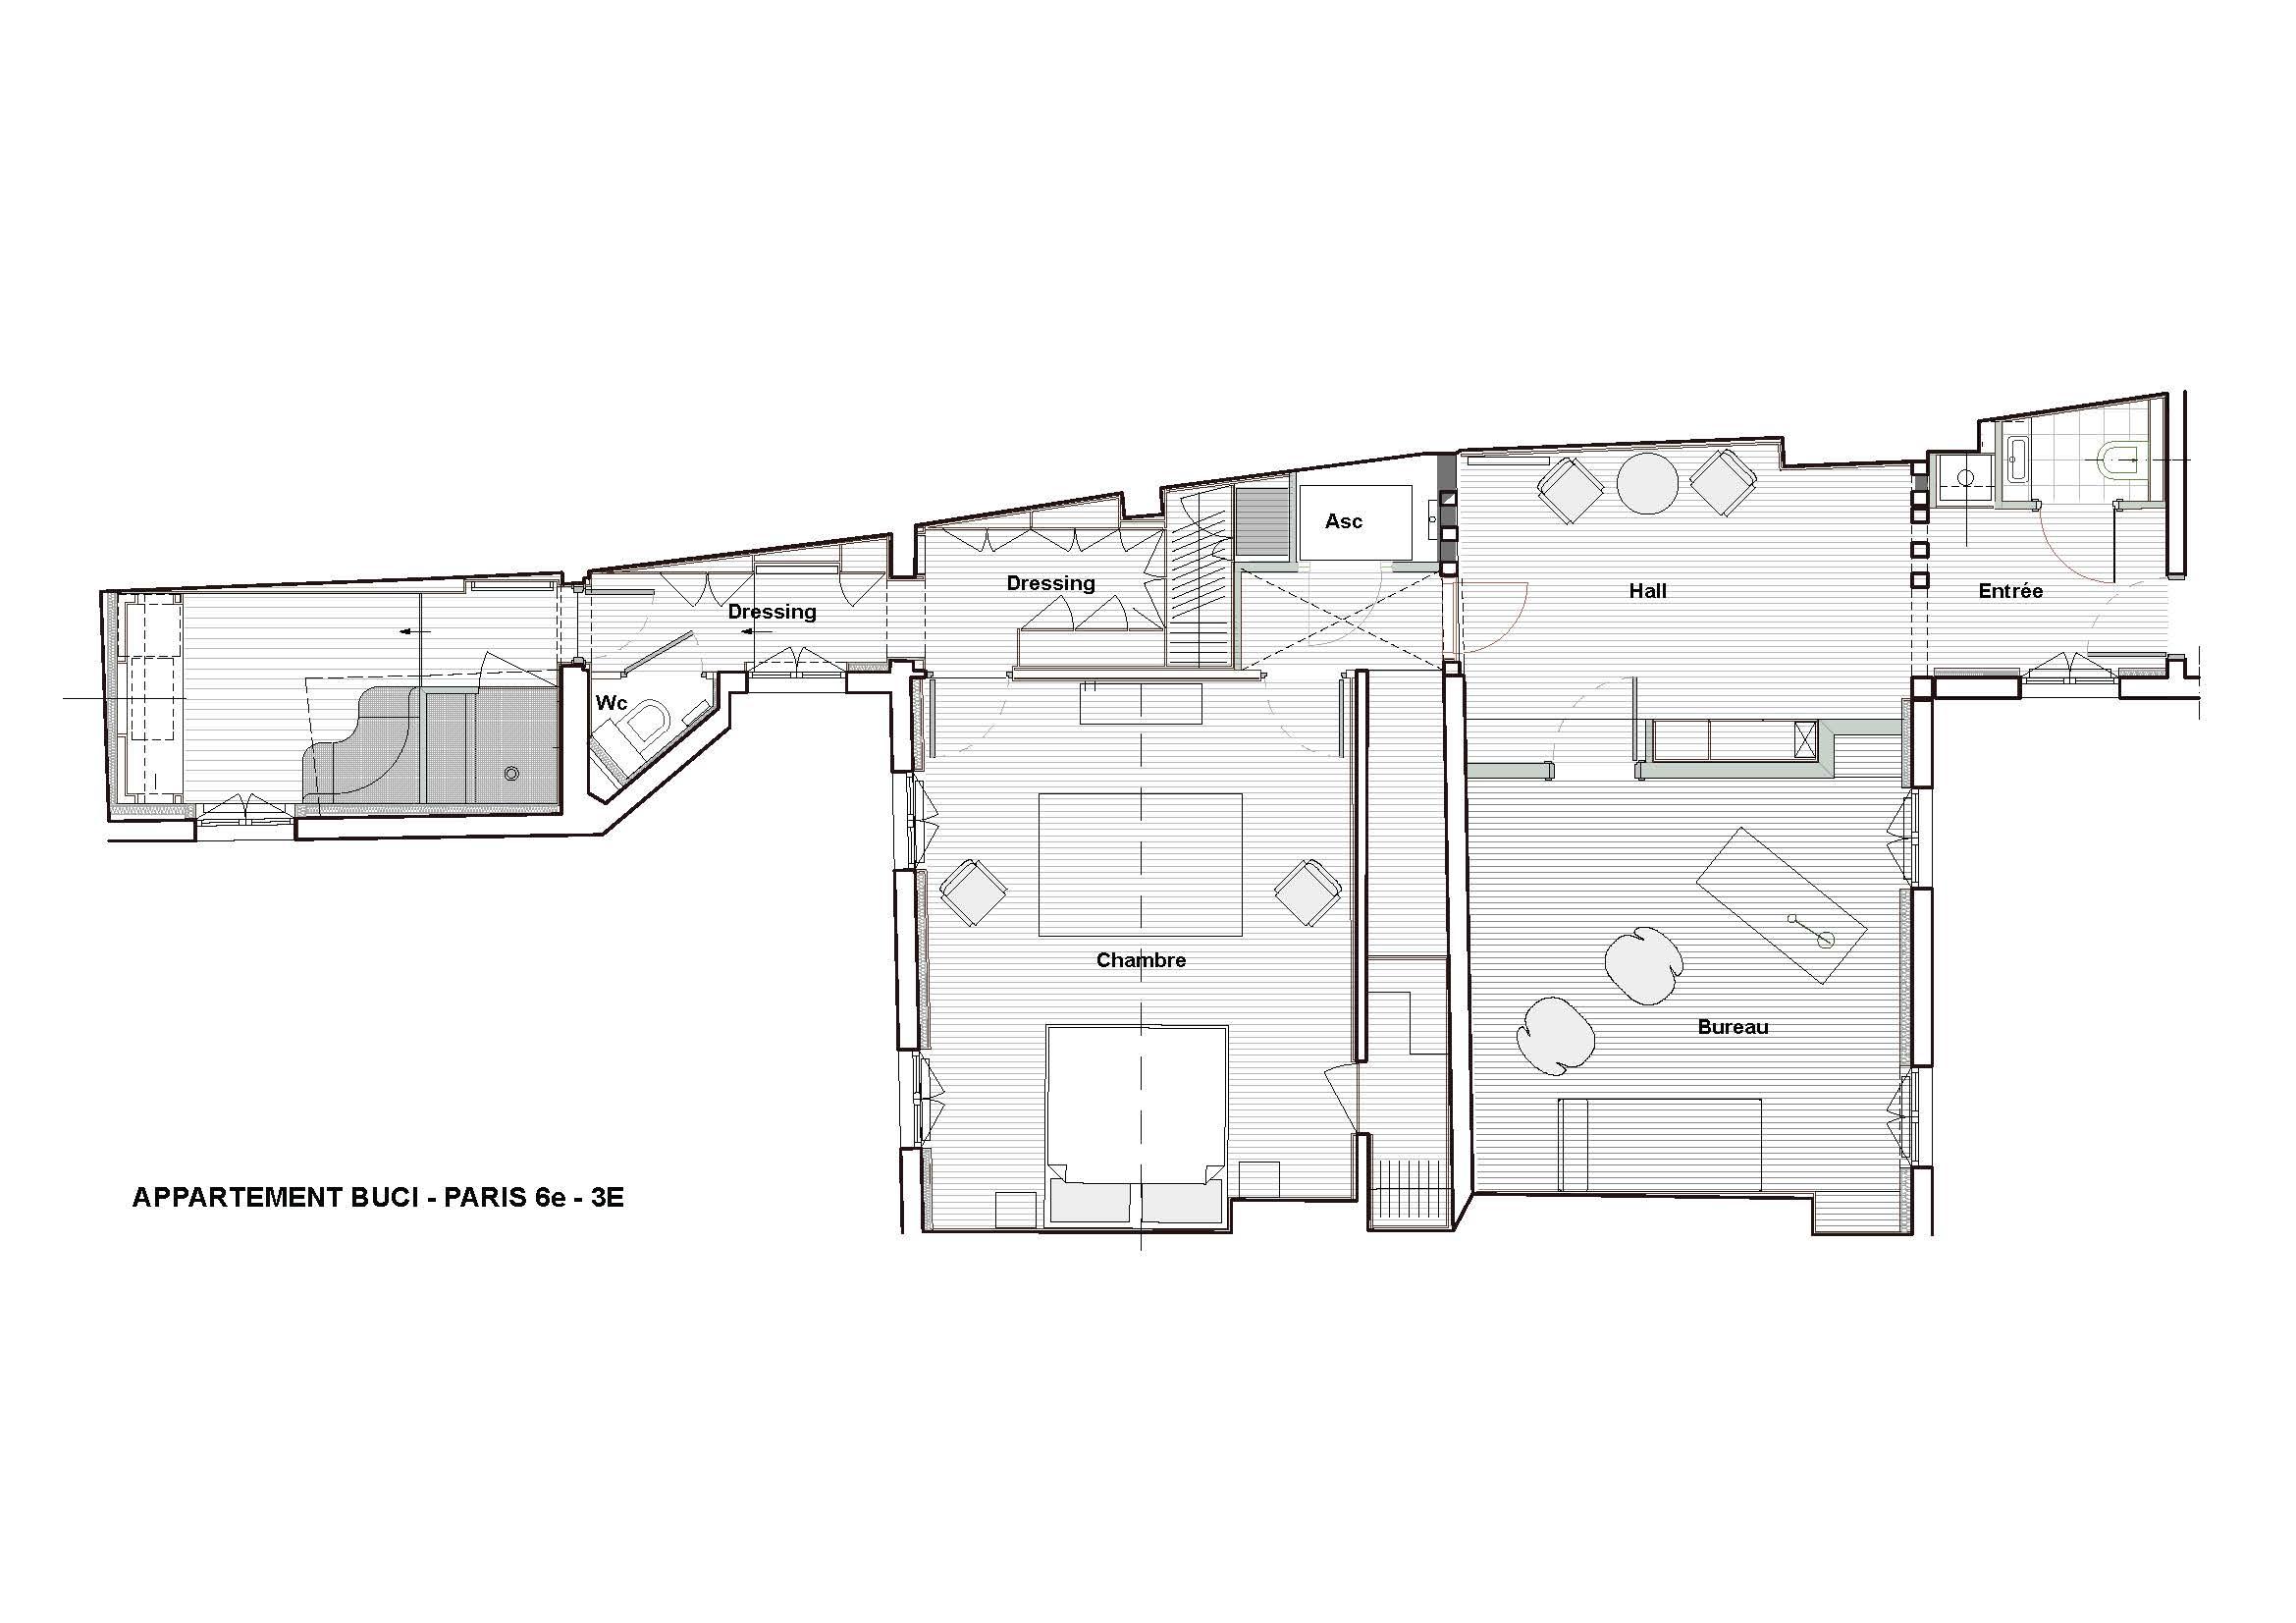 Plan du 3e